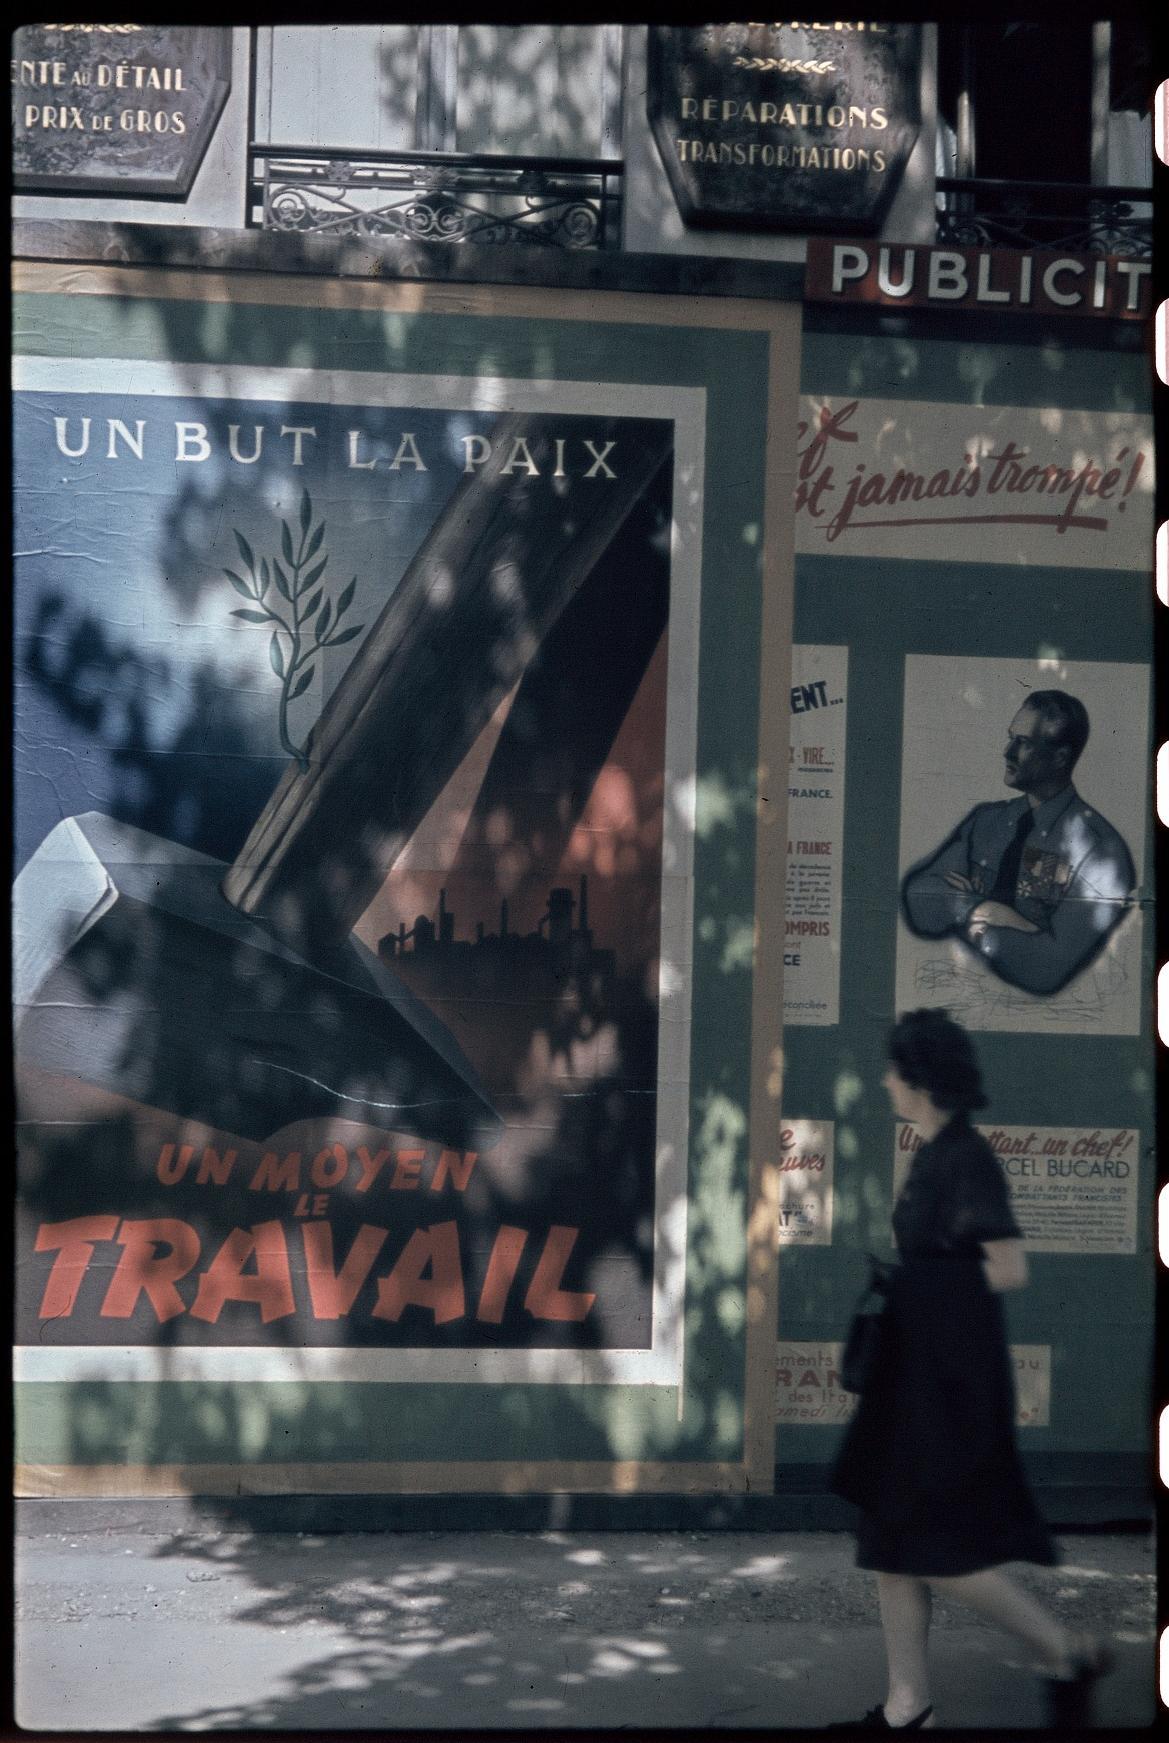 Пропагандистский плакат